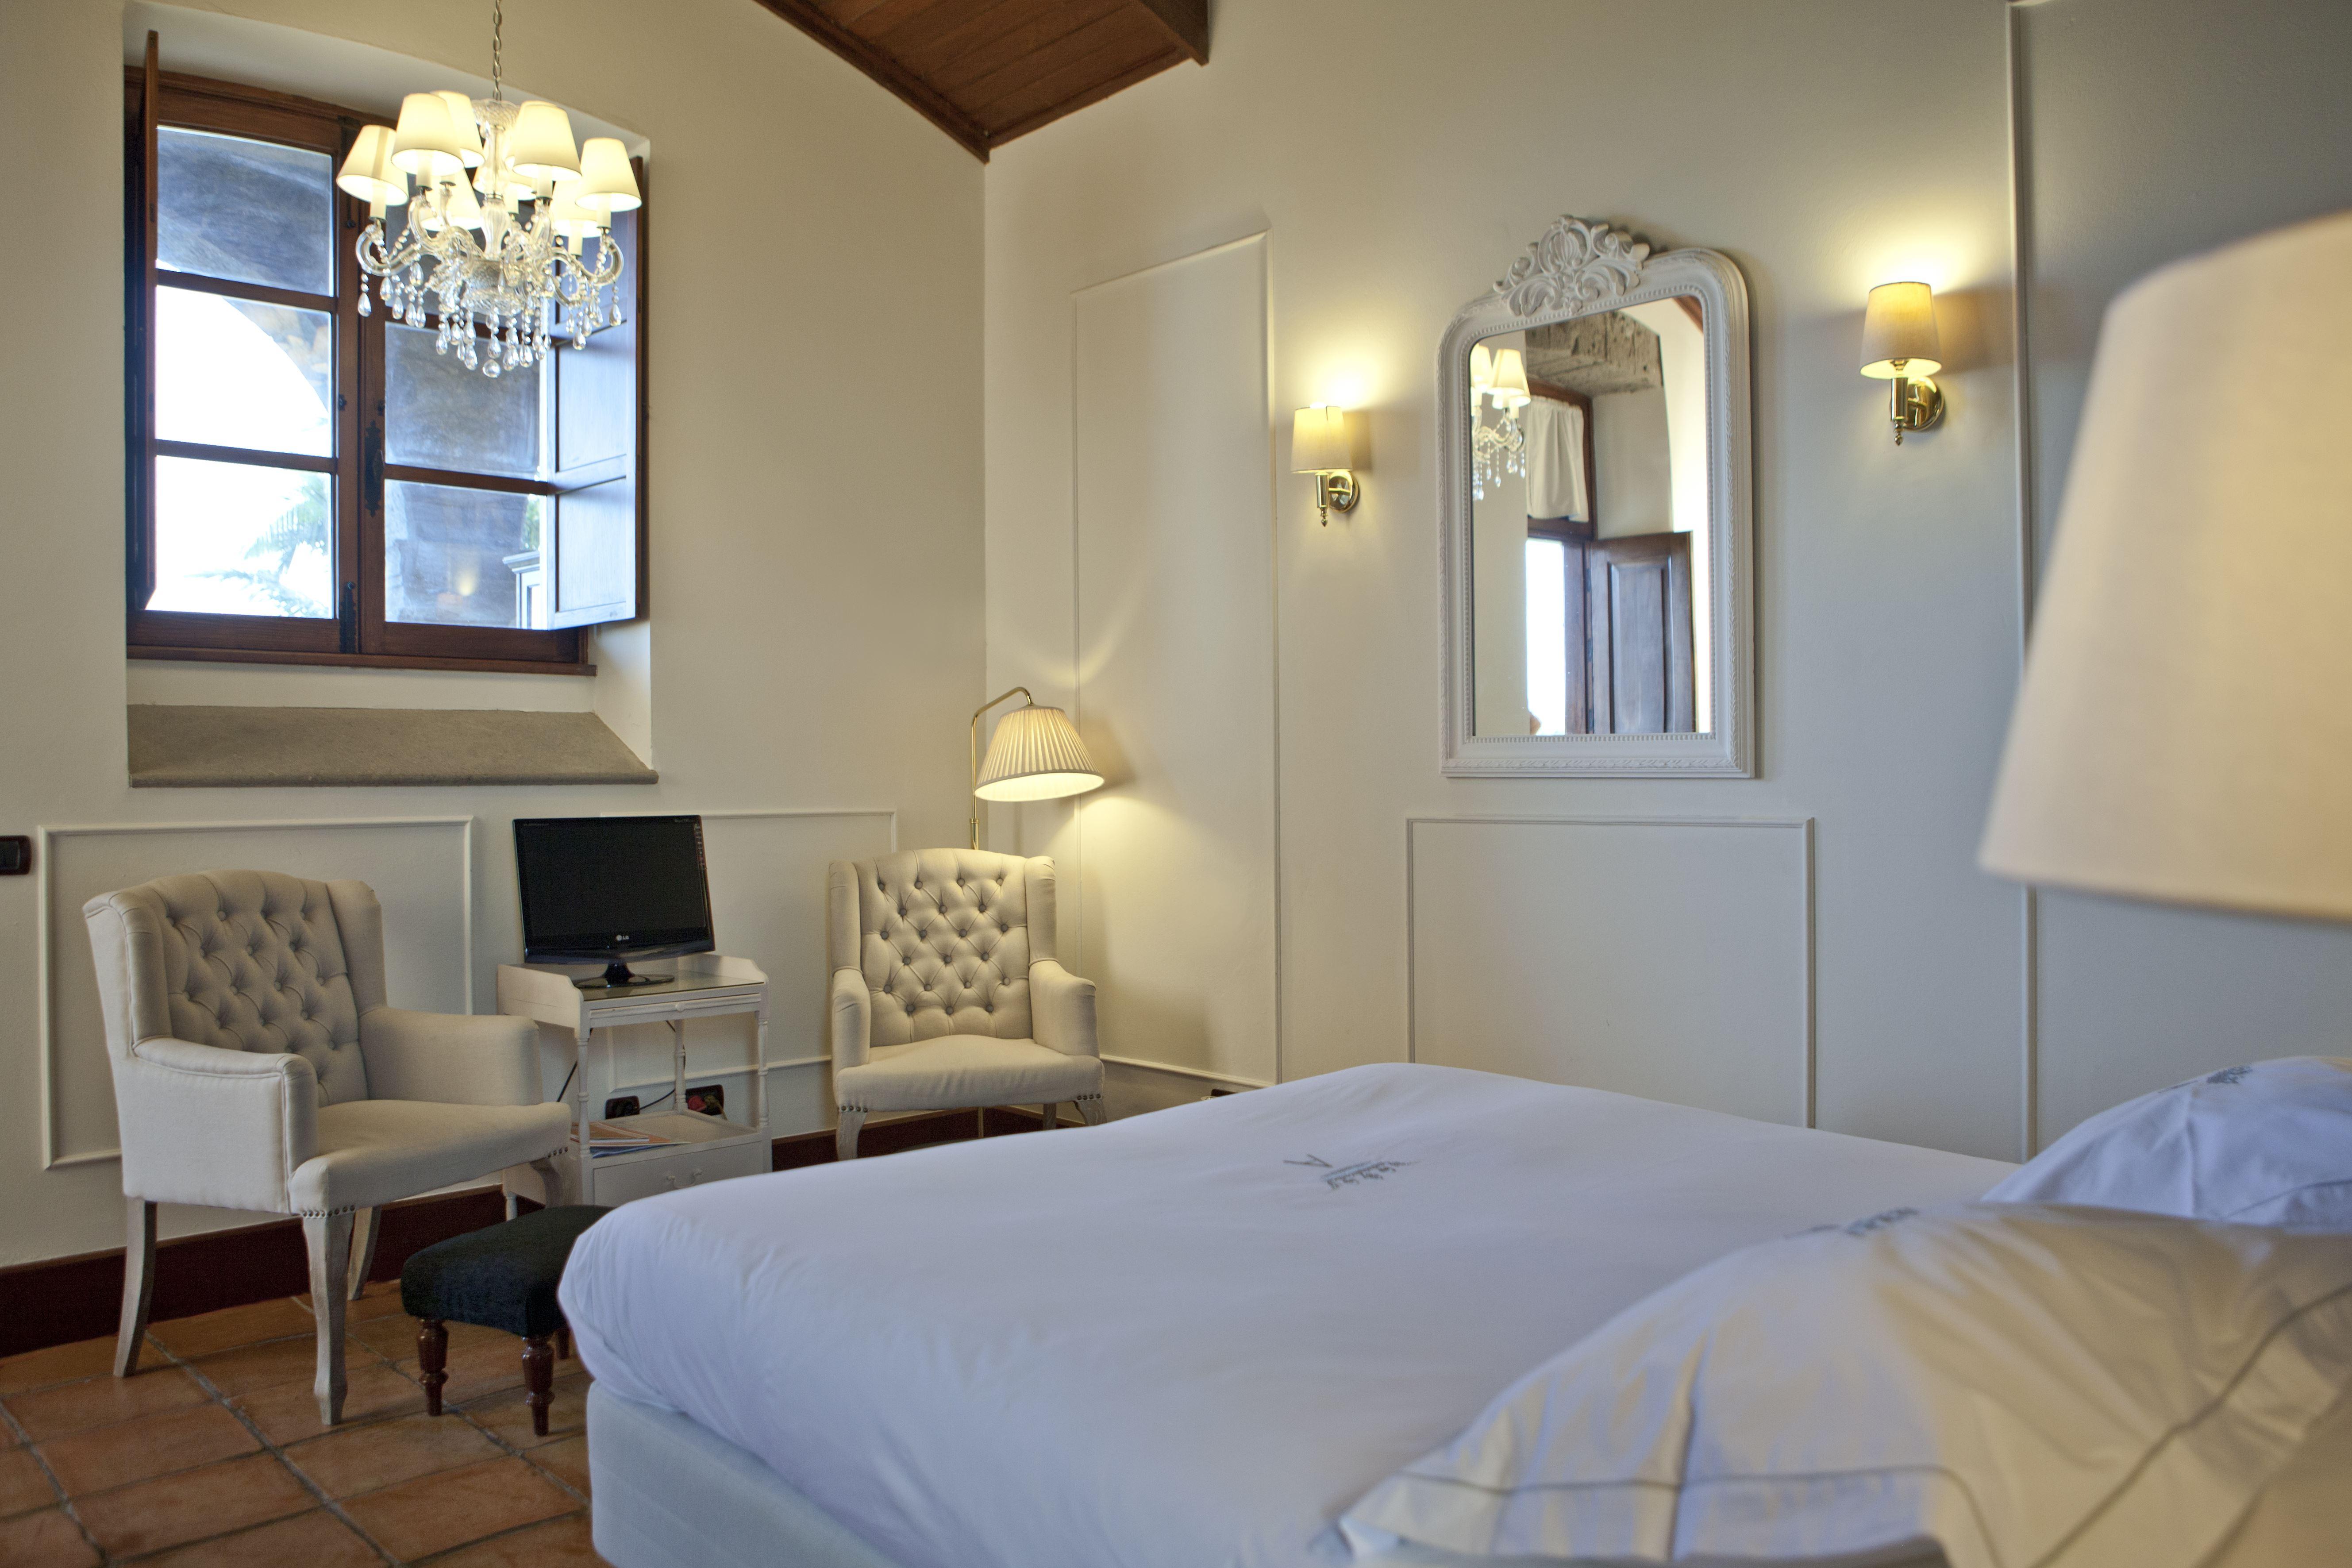 Dubbelrum Hotell Christina, Las Palmas Gran Canaria